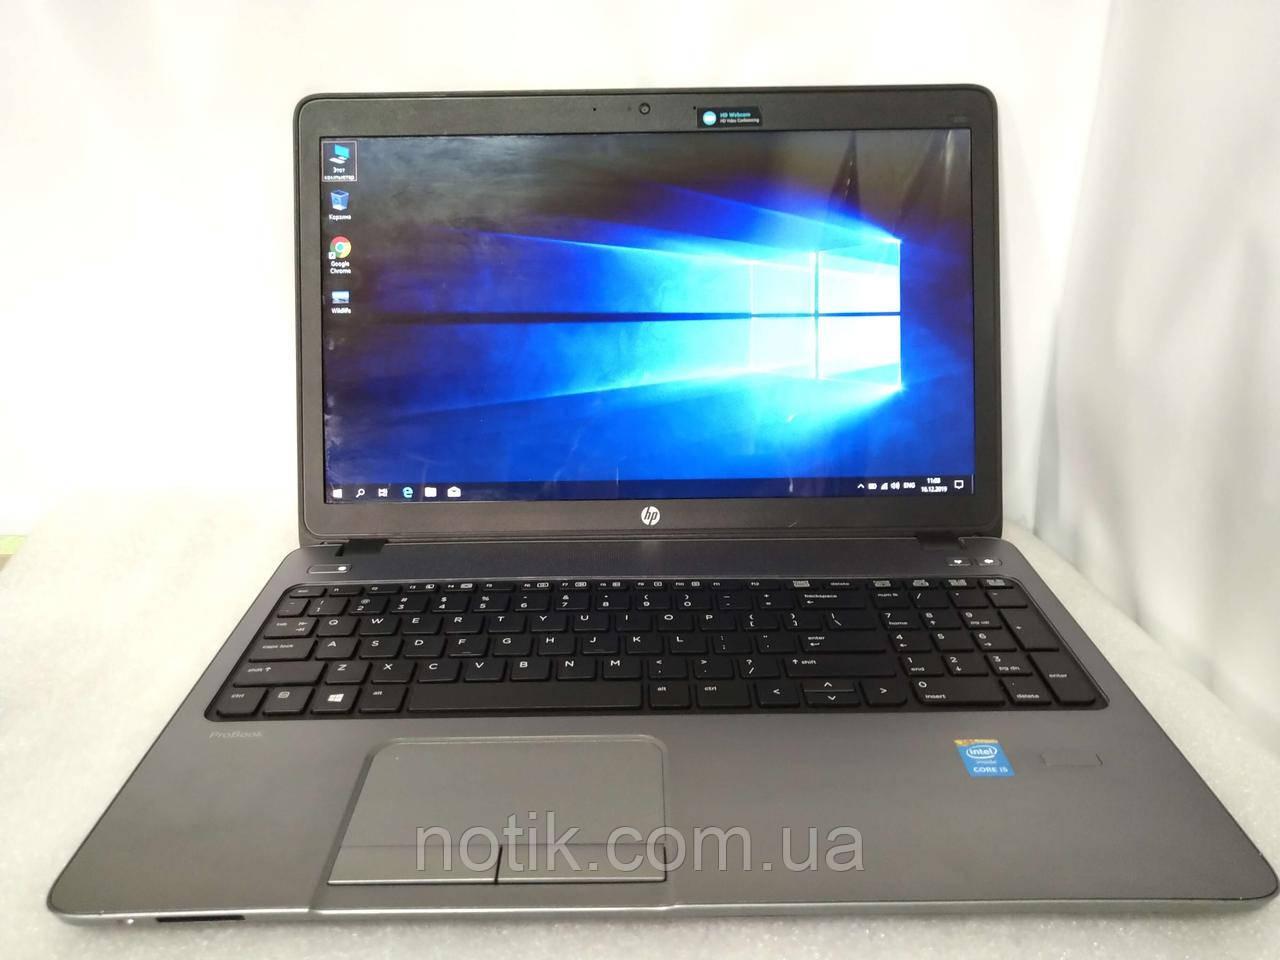 "Ноутбук HP 450 G1 i5-4200M/4Gb/SSD 240Gb/15.6"""